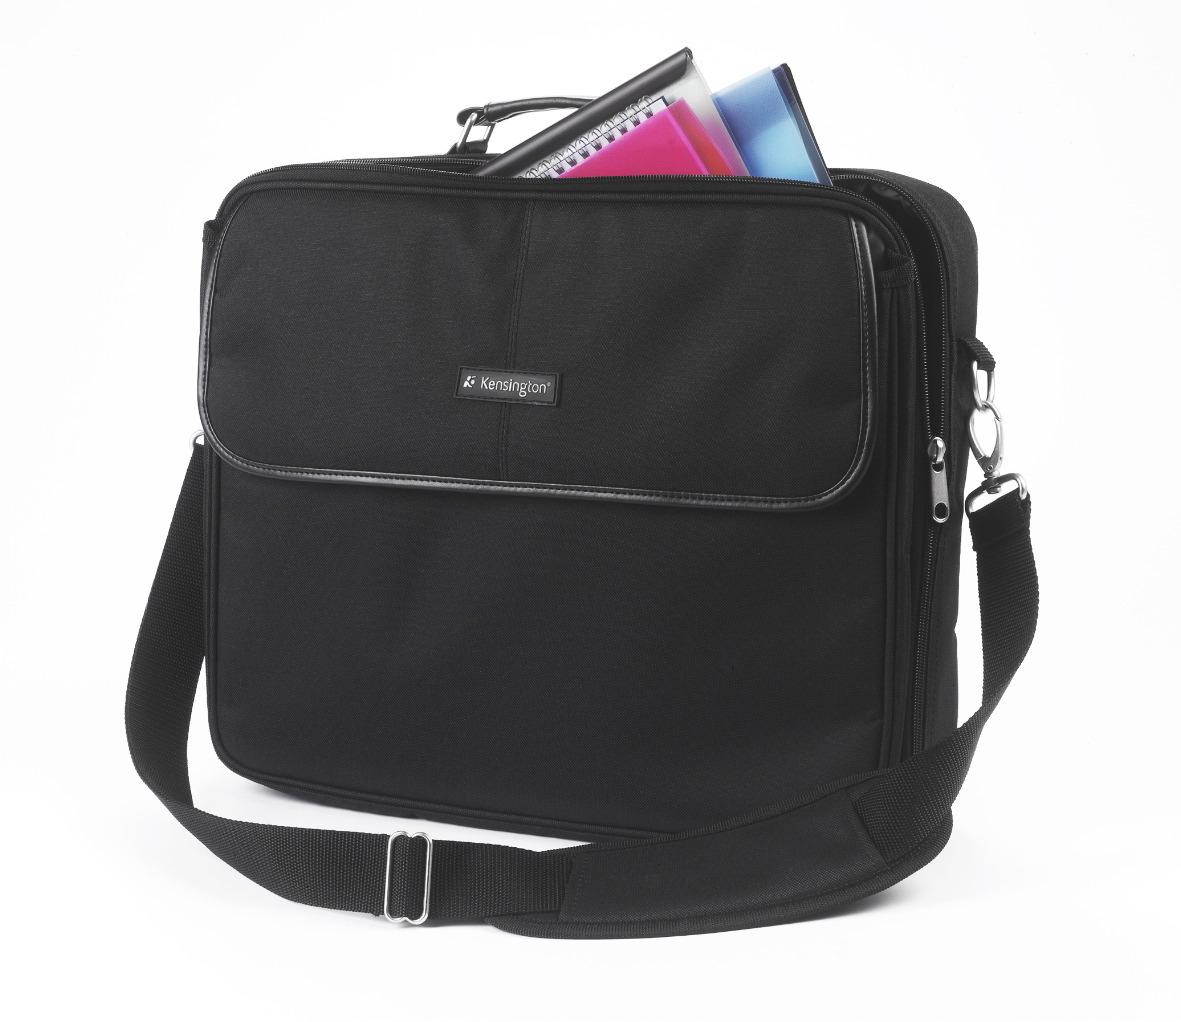 Kensington sp30 clamshell case laptop 15 6in k62560eu for Clamshell casing